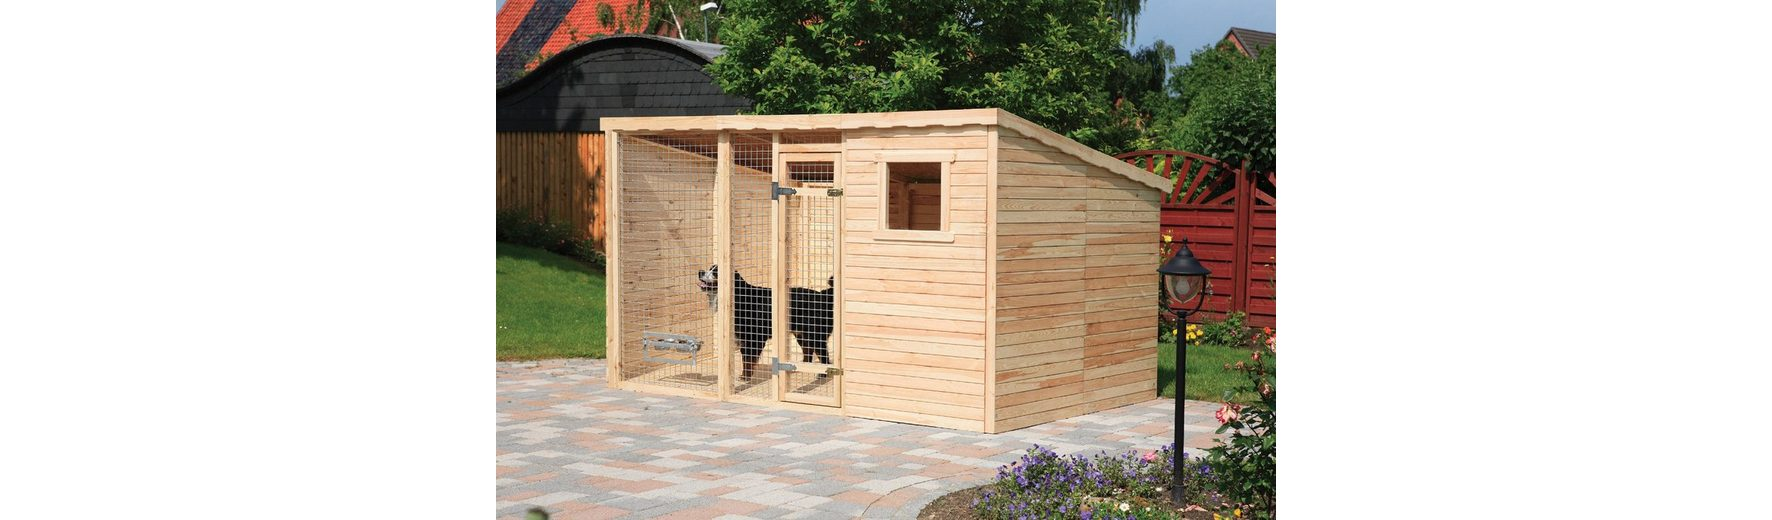 Hundezwinger, Grundfläche: 11,0 m², inkl. Fußboden